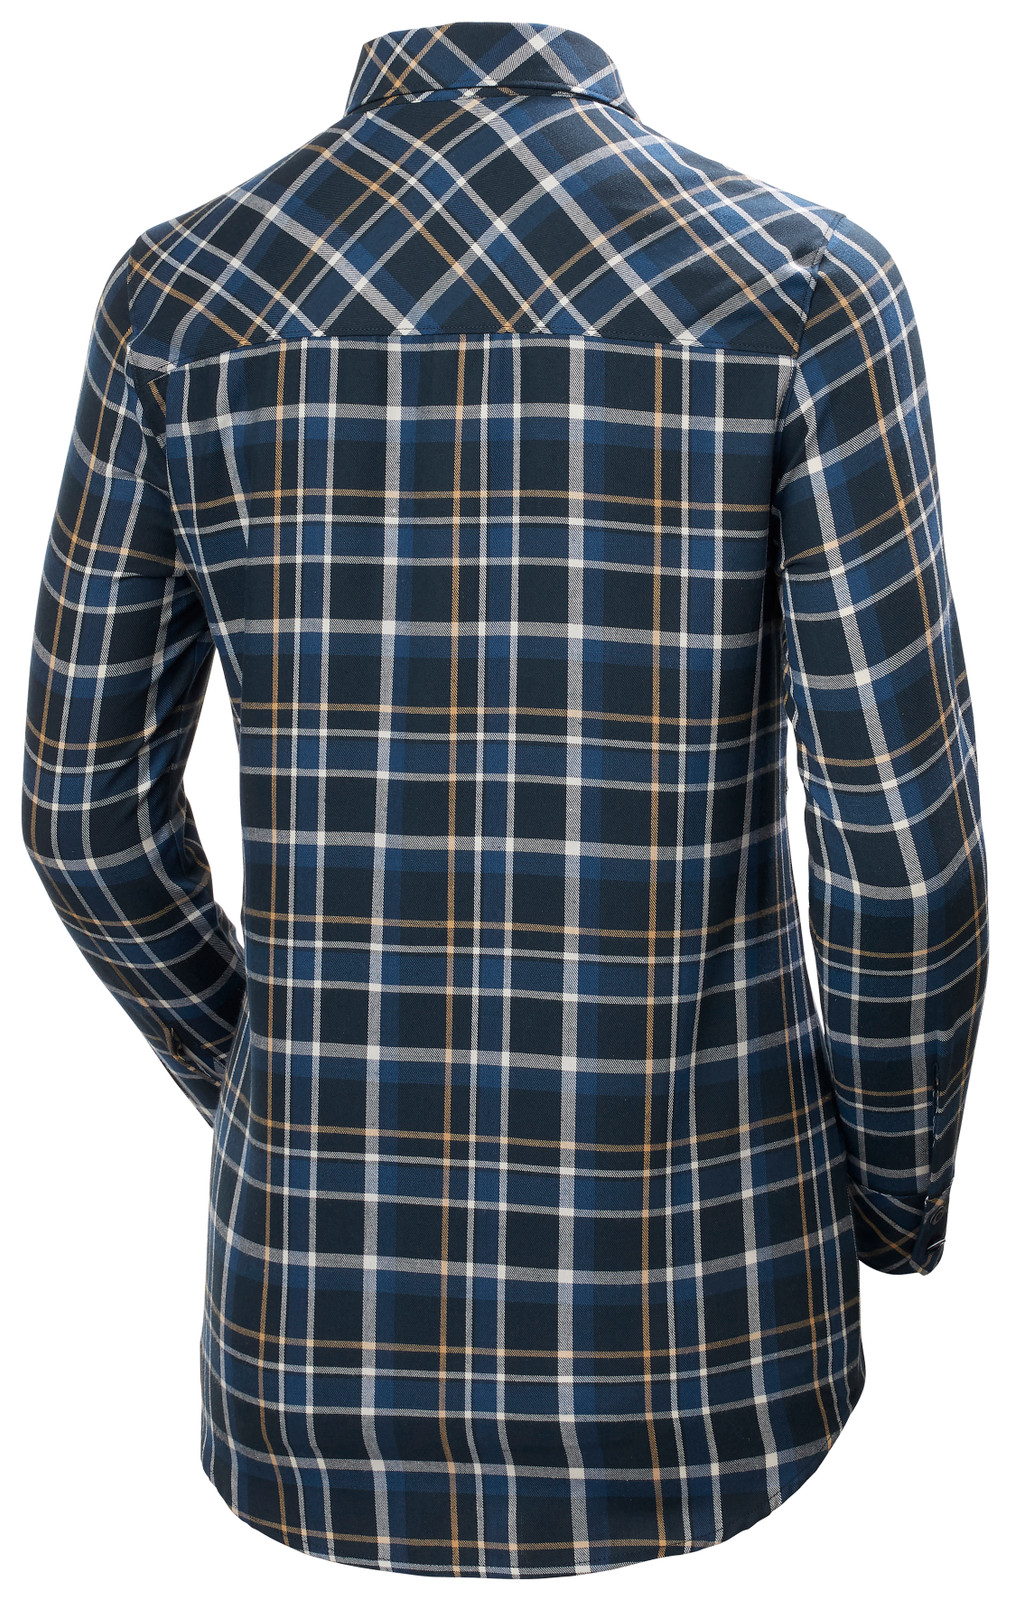 Helly Hansen Lokka LS Shirt, Women's - Navy, 62875-597